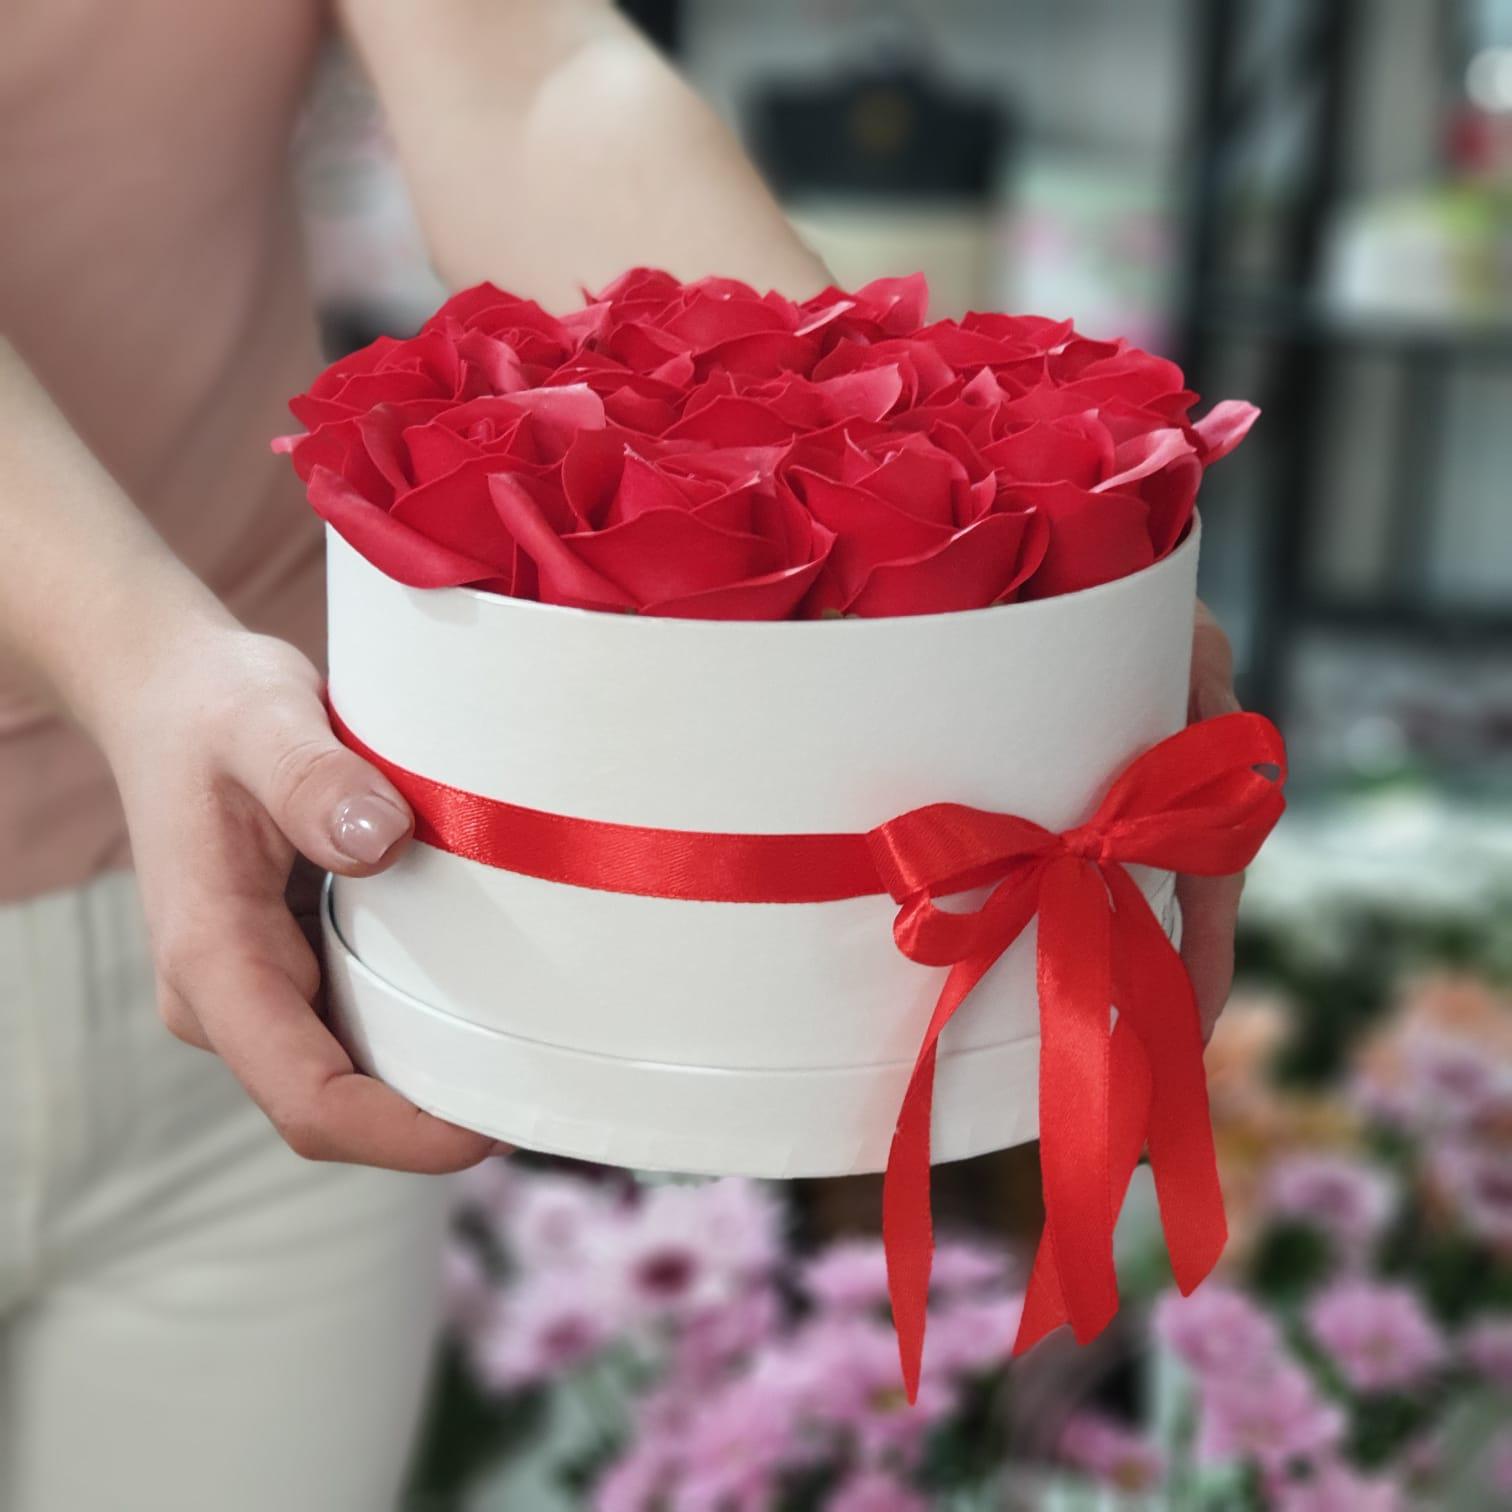 Aranjament cu trandafiri din sapun (S)